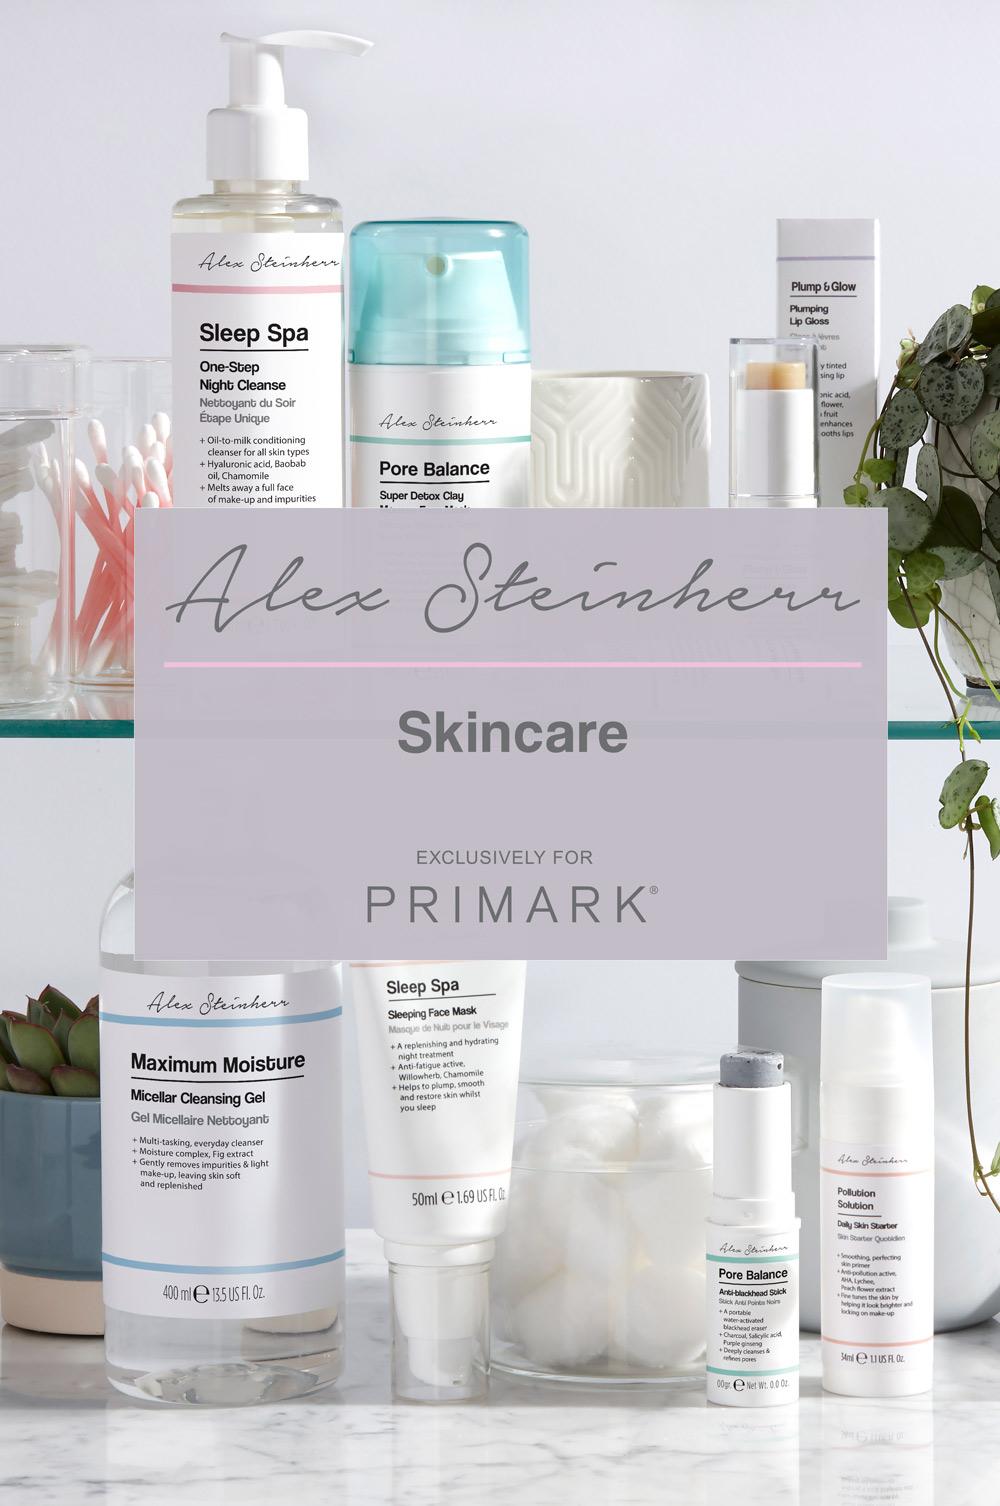 Primark linea cosmeticos